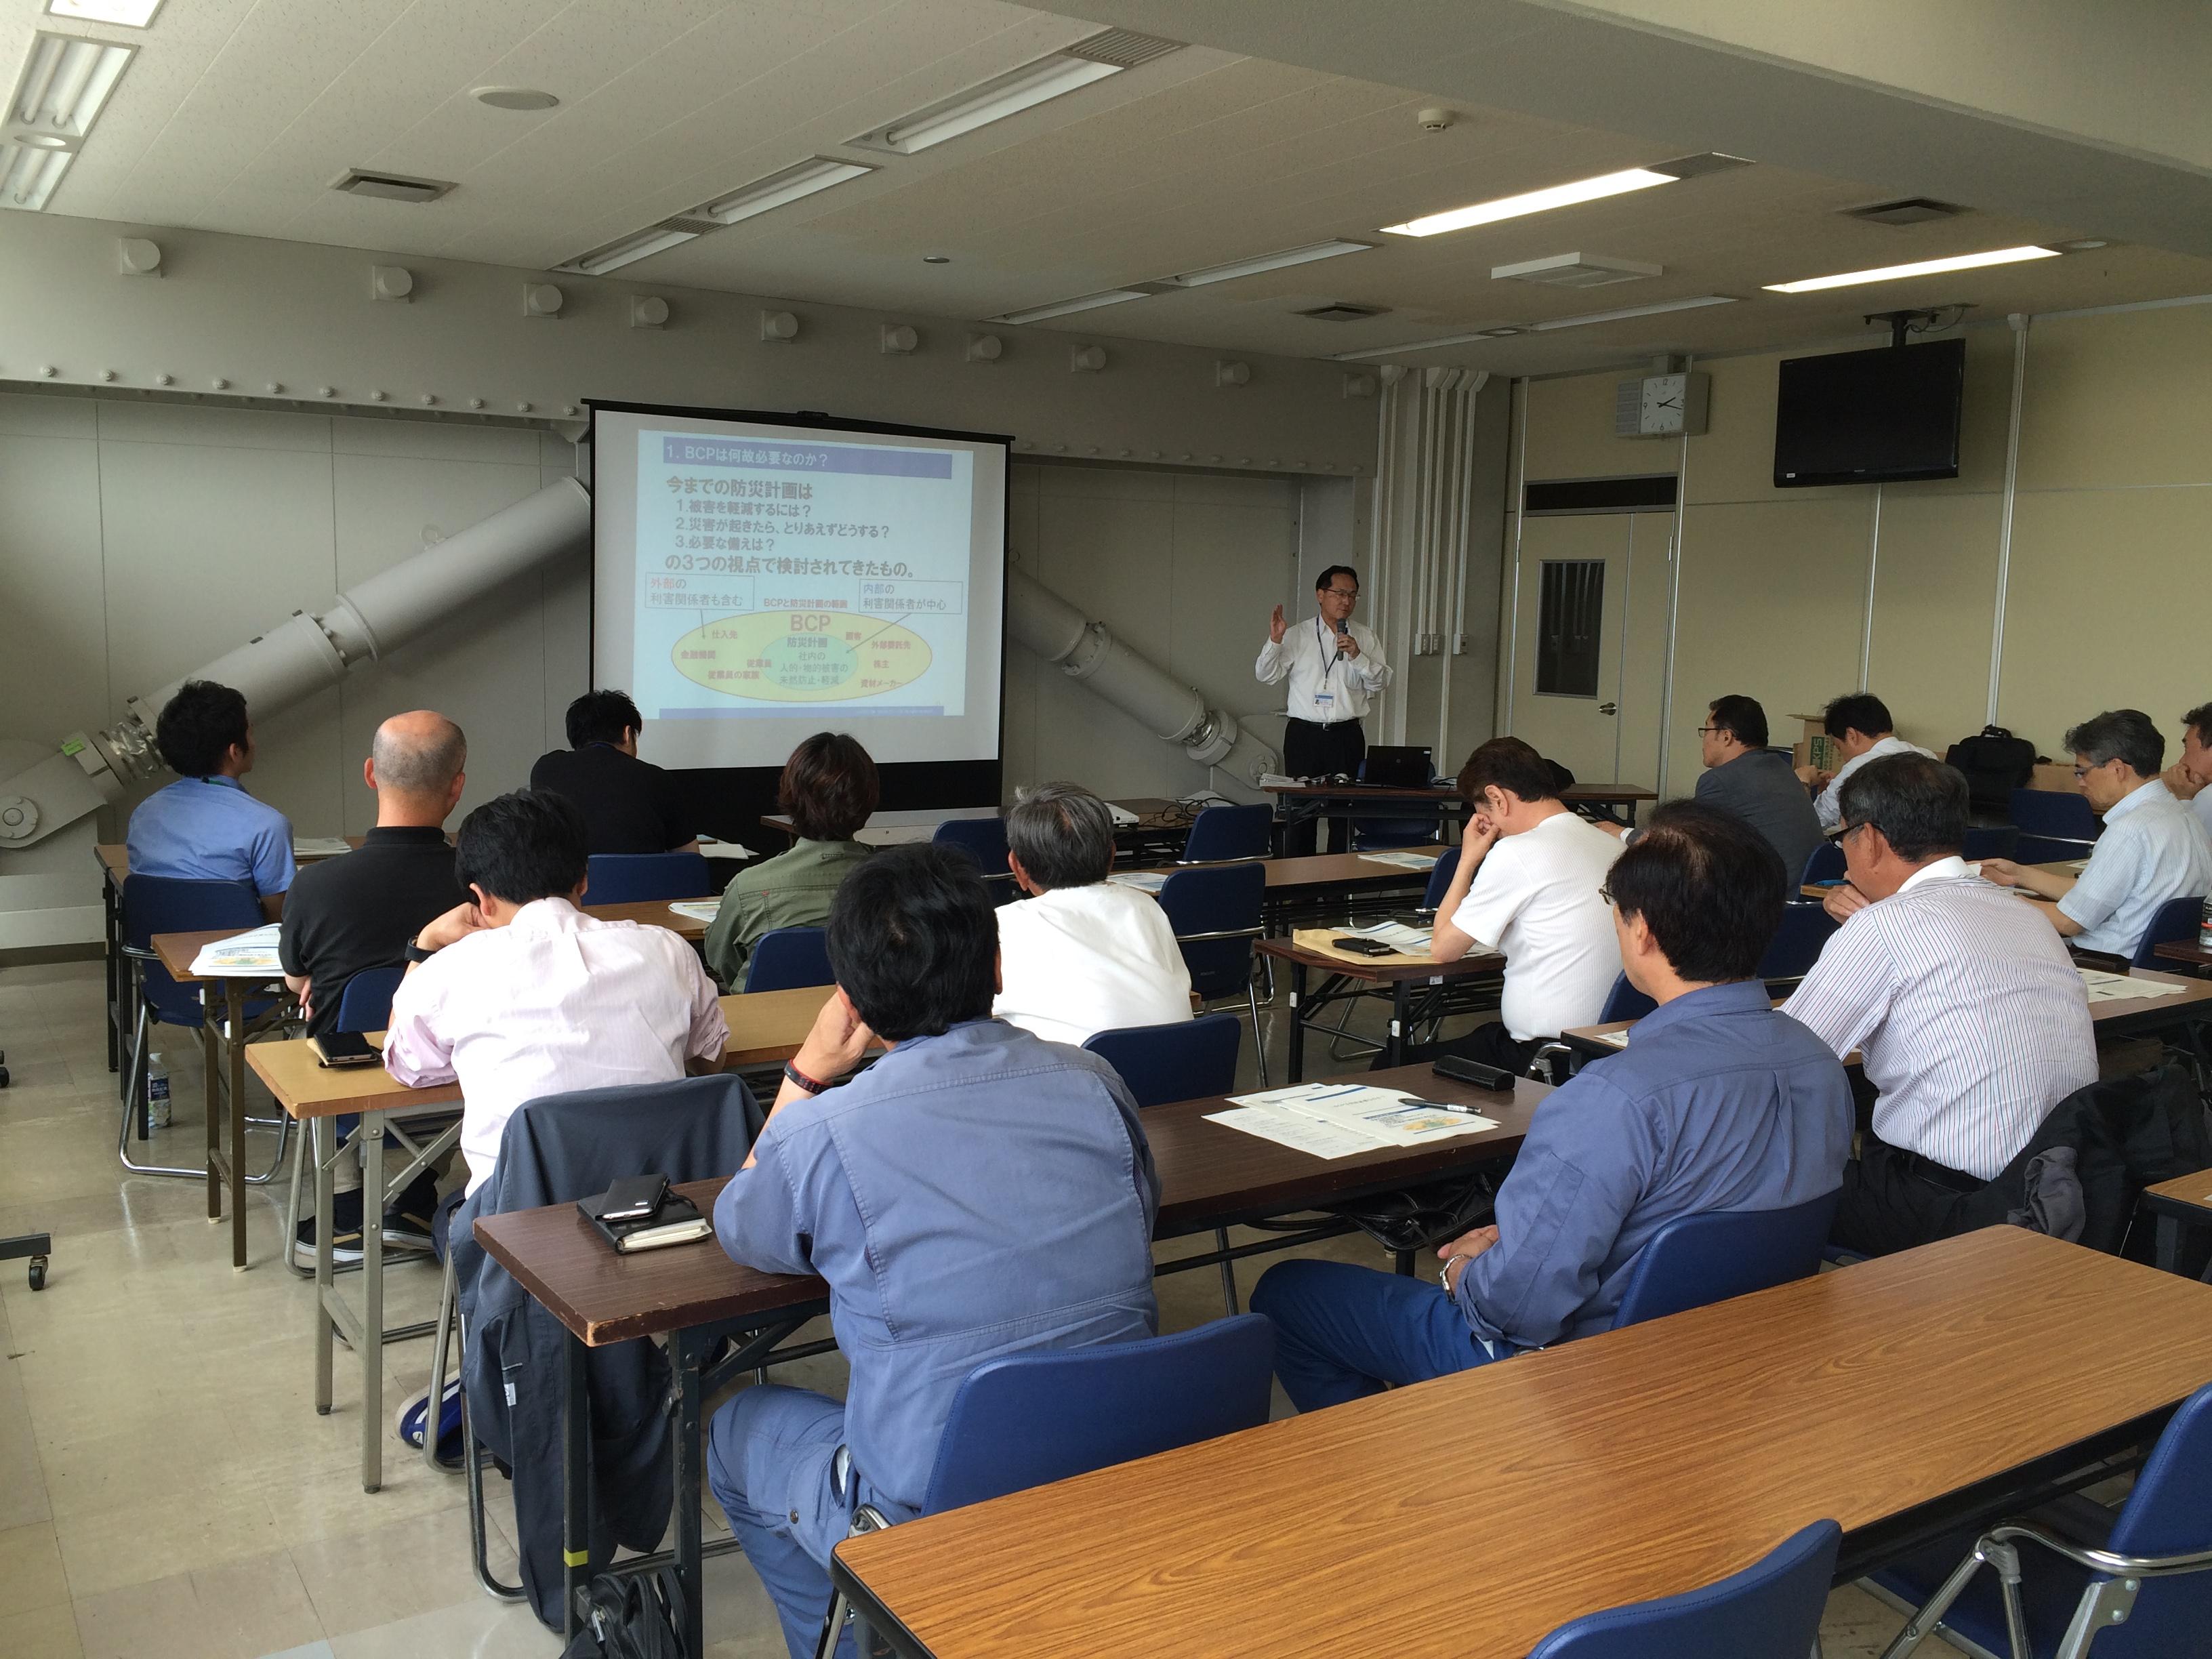 http://www.inaba-kankyo.co.jp/news/photo/IMG_0366.JPG